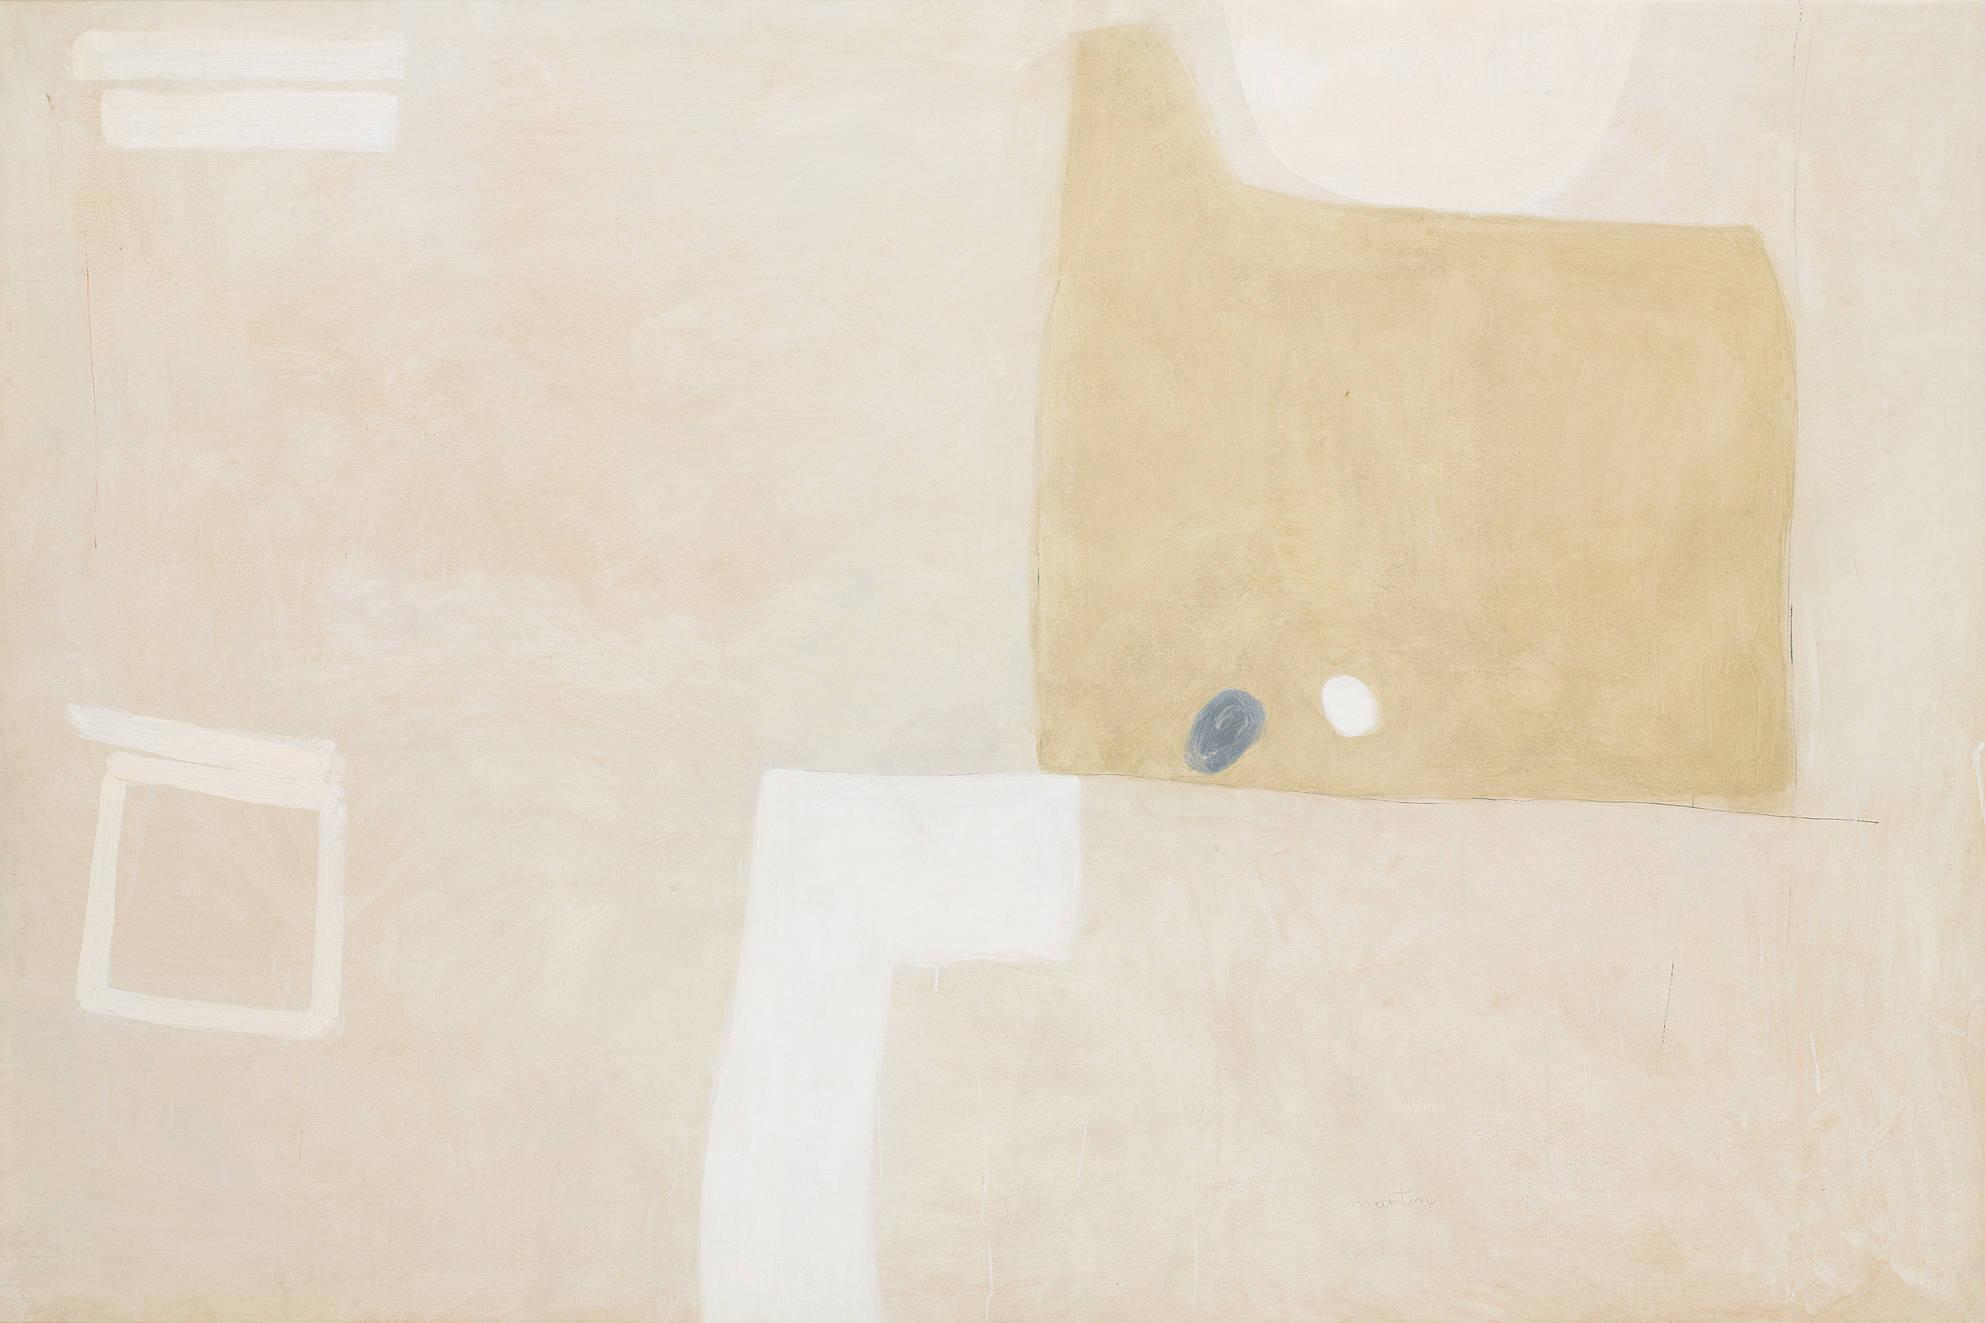 Artist: Agnes Martin | Untitled, 1957